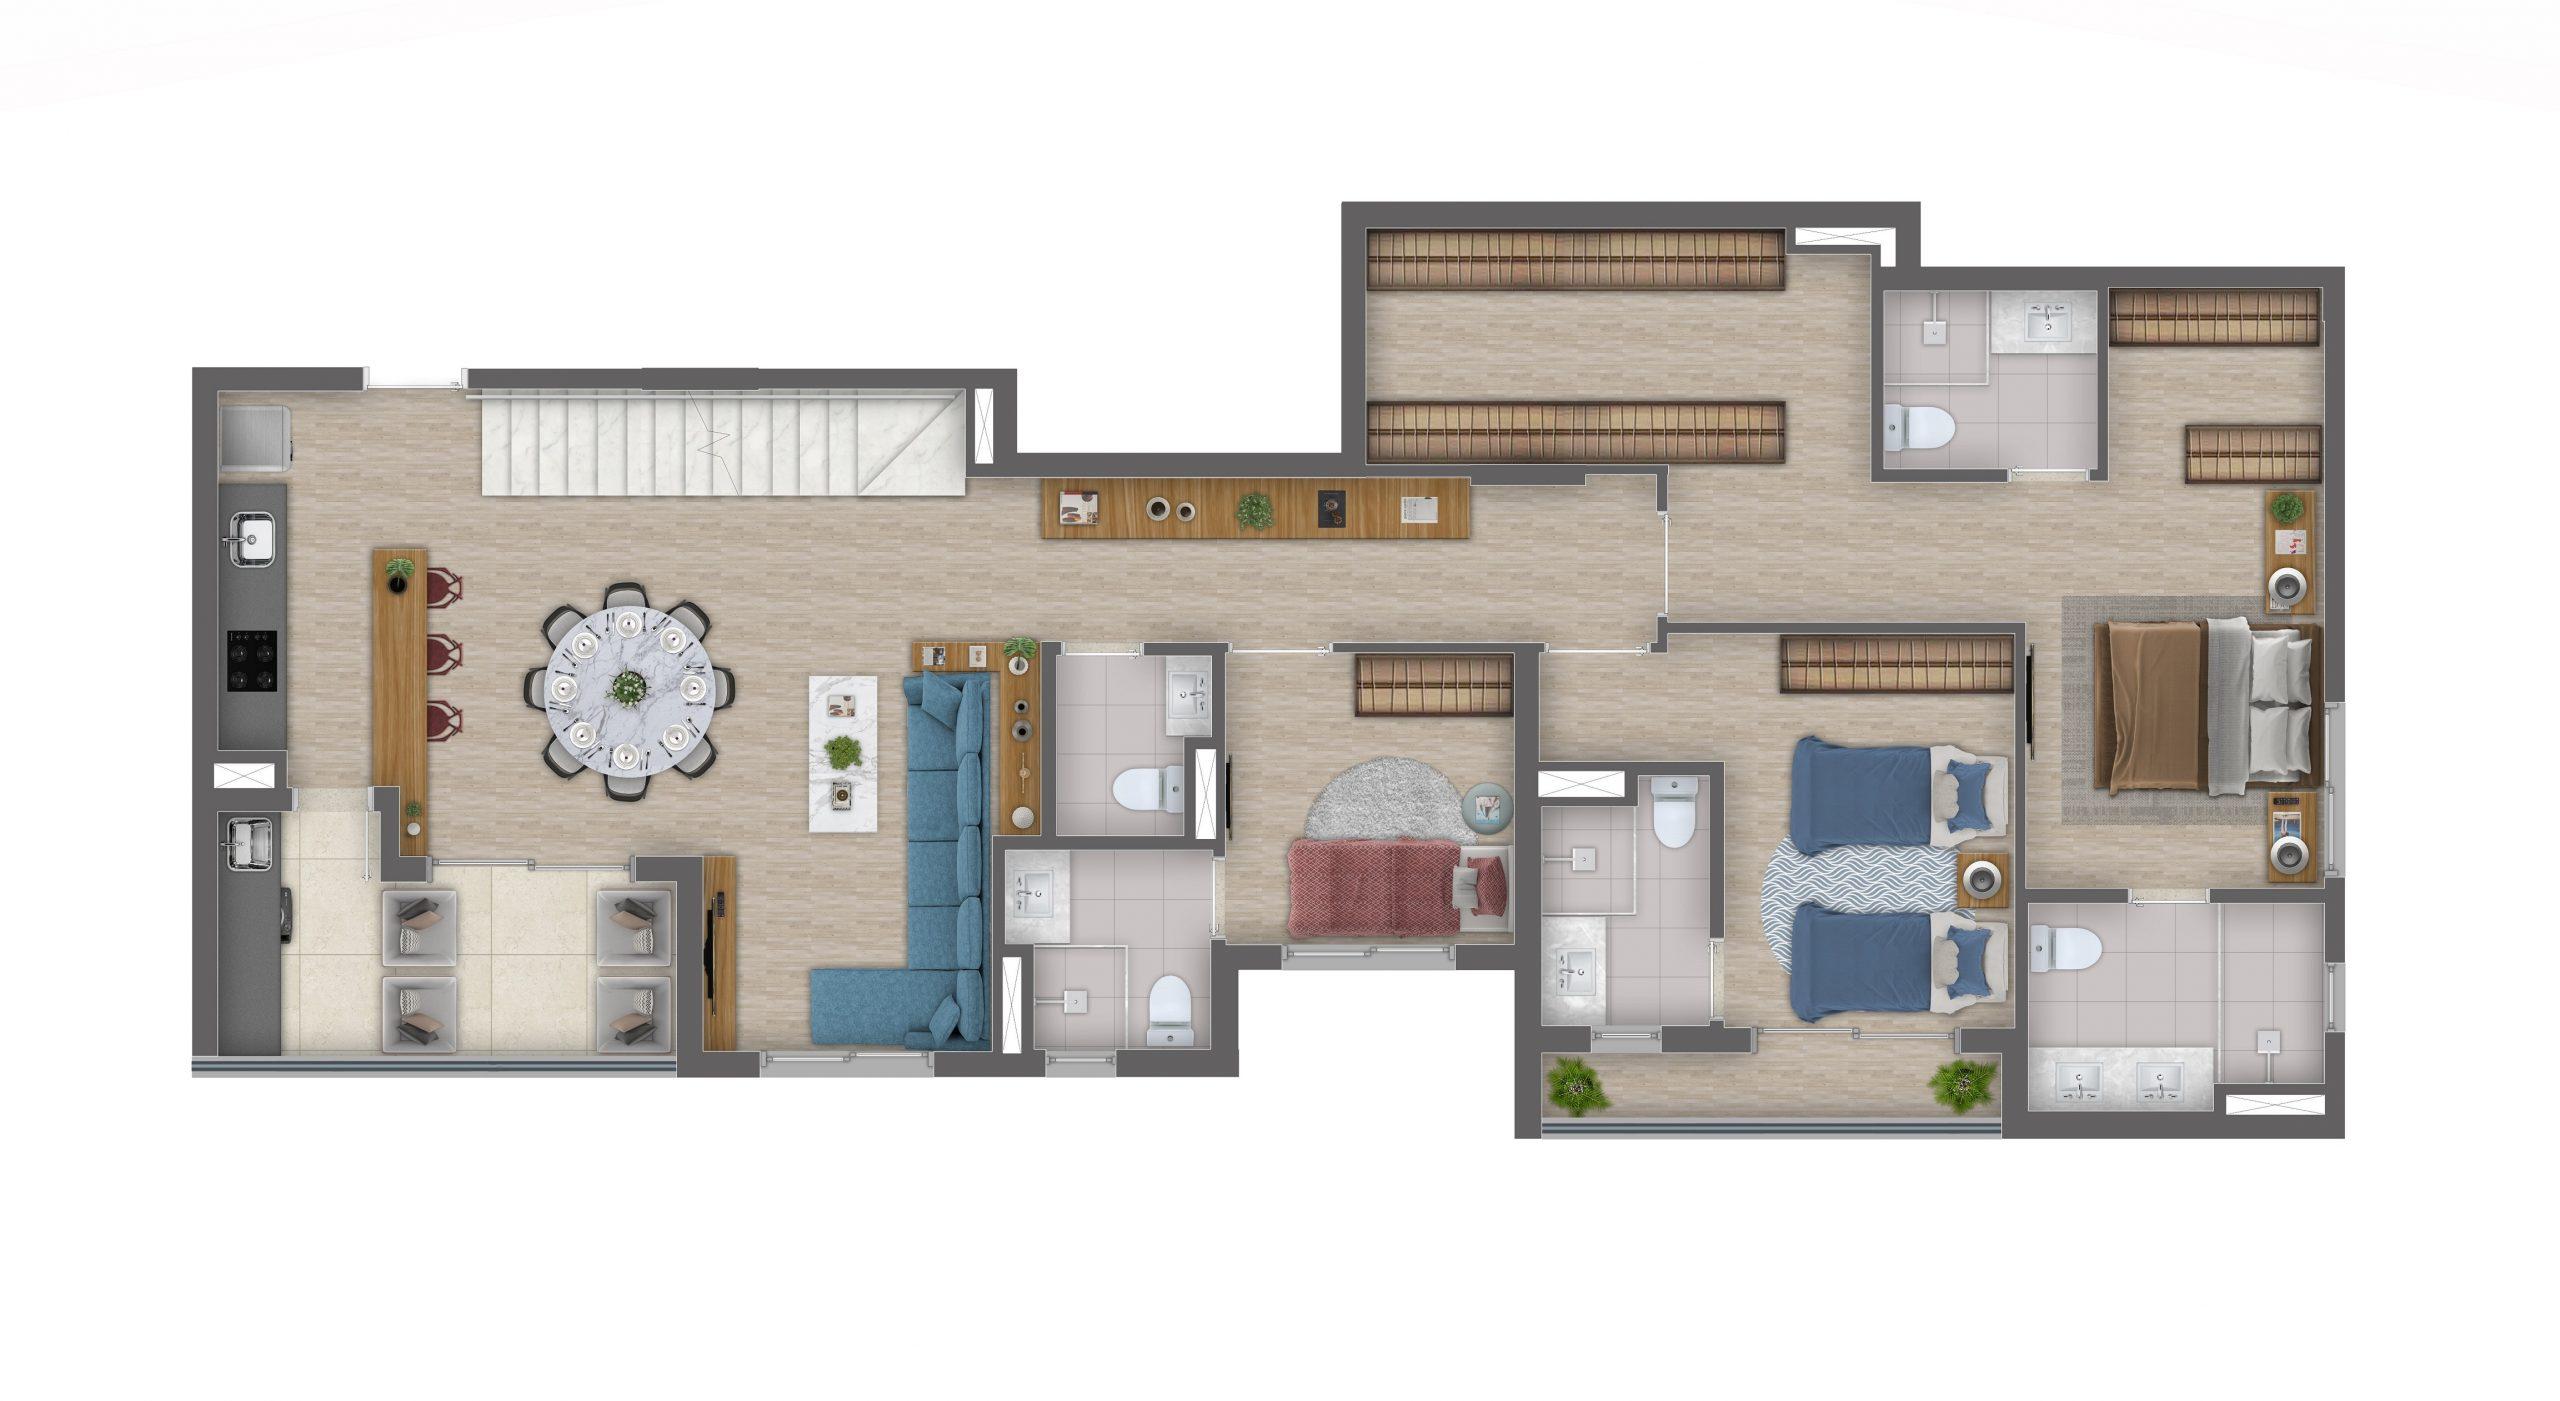 Cobertura - 230m² - 3 Suítes - Piso Inferior